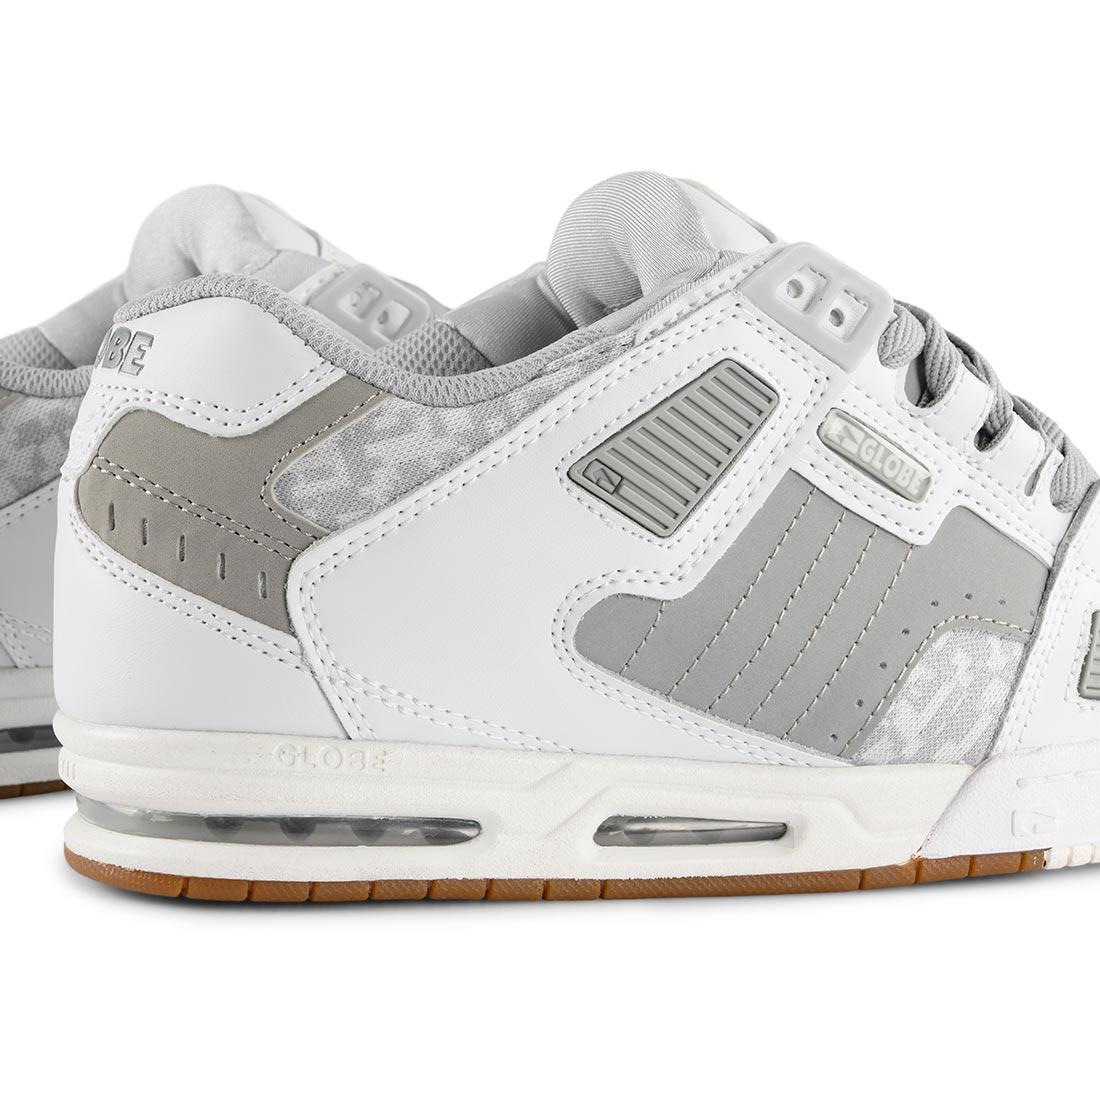 Globe Sabre Shoes – White / Grey / Gum